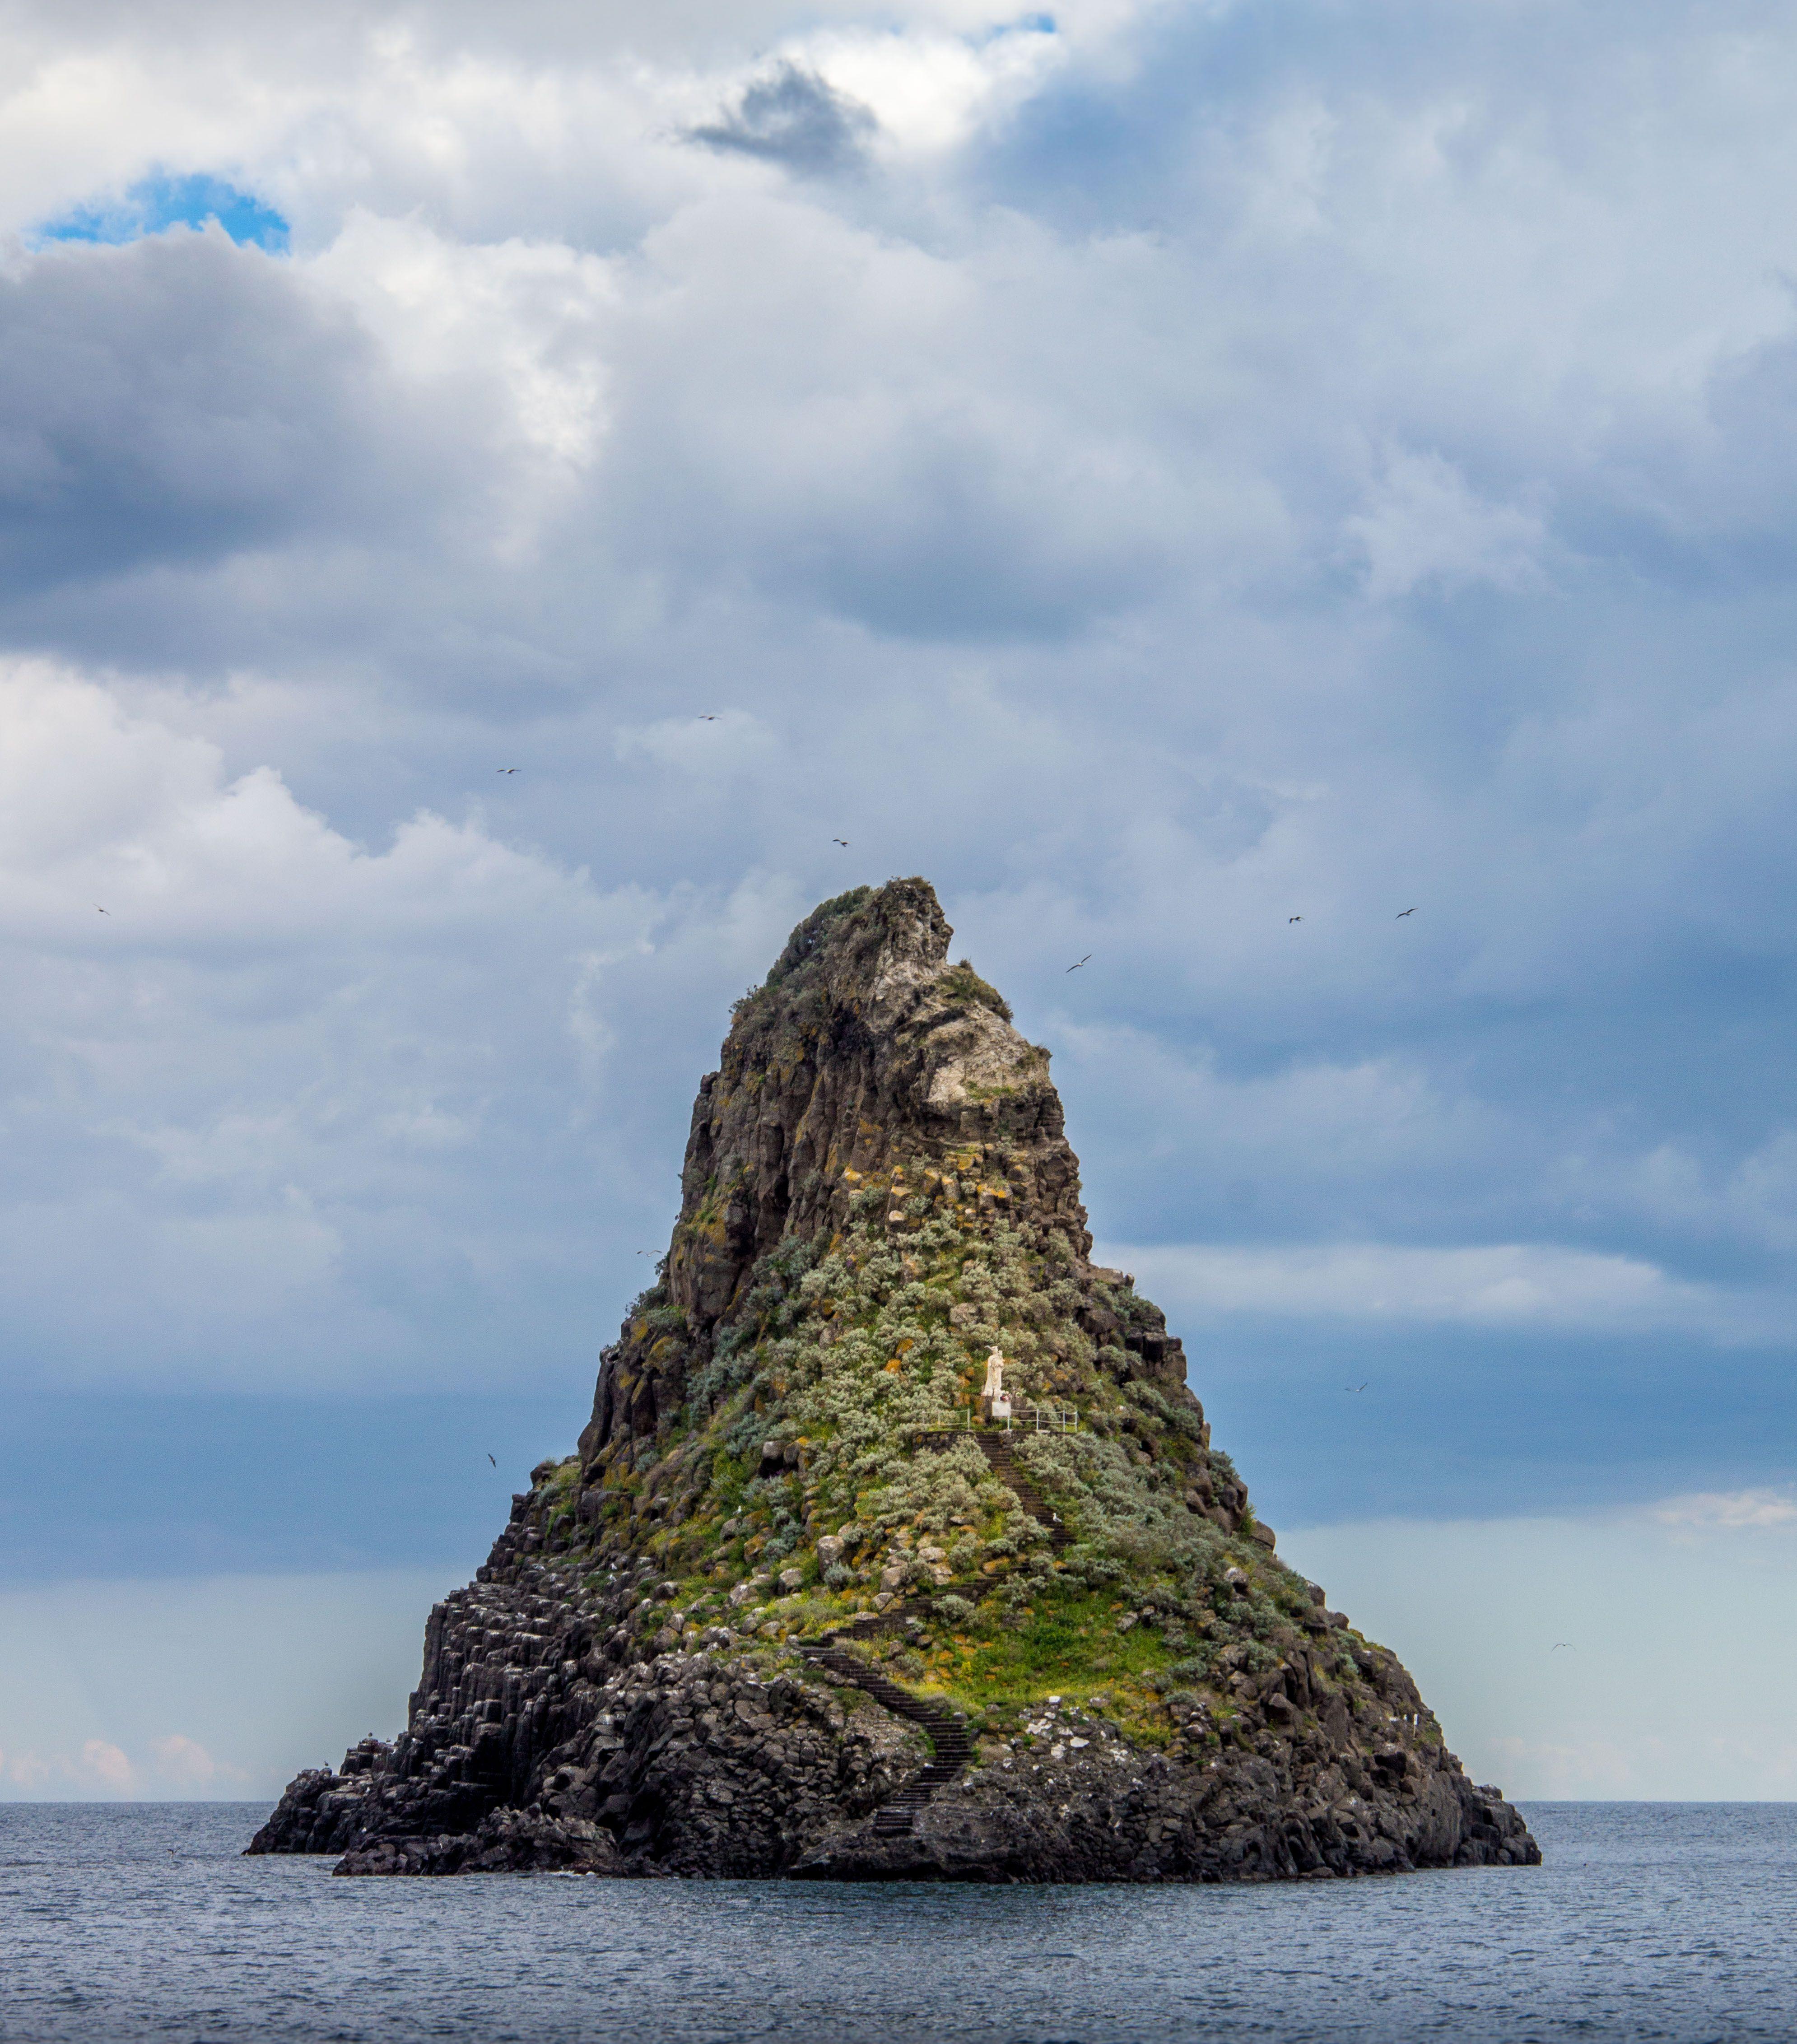 Isole dei Ciclopi (Aci Trezza)   Sicily, Spires, Monument